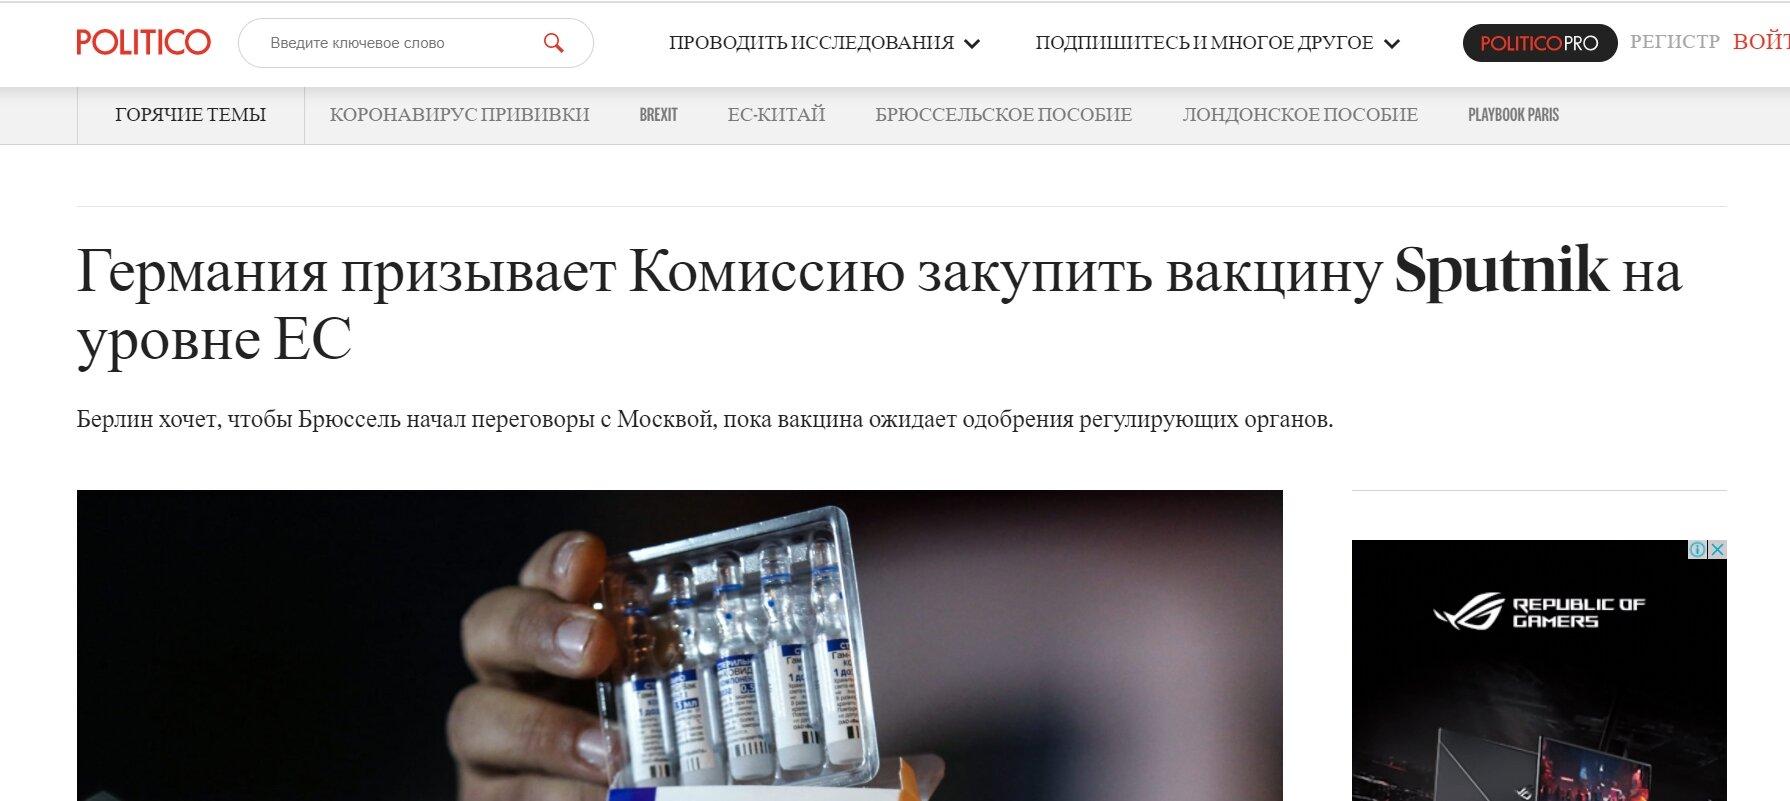 Germany urges Commission to purchase Sputnik vaccine at EU level – POLITICO - Google Chrome_210325013425.jpg